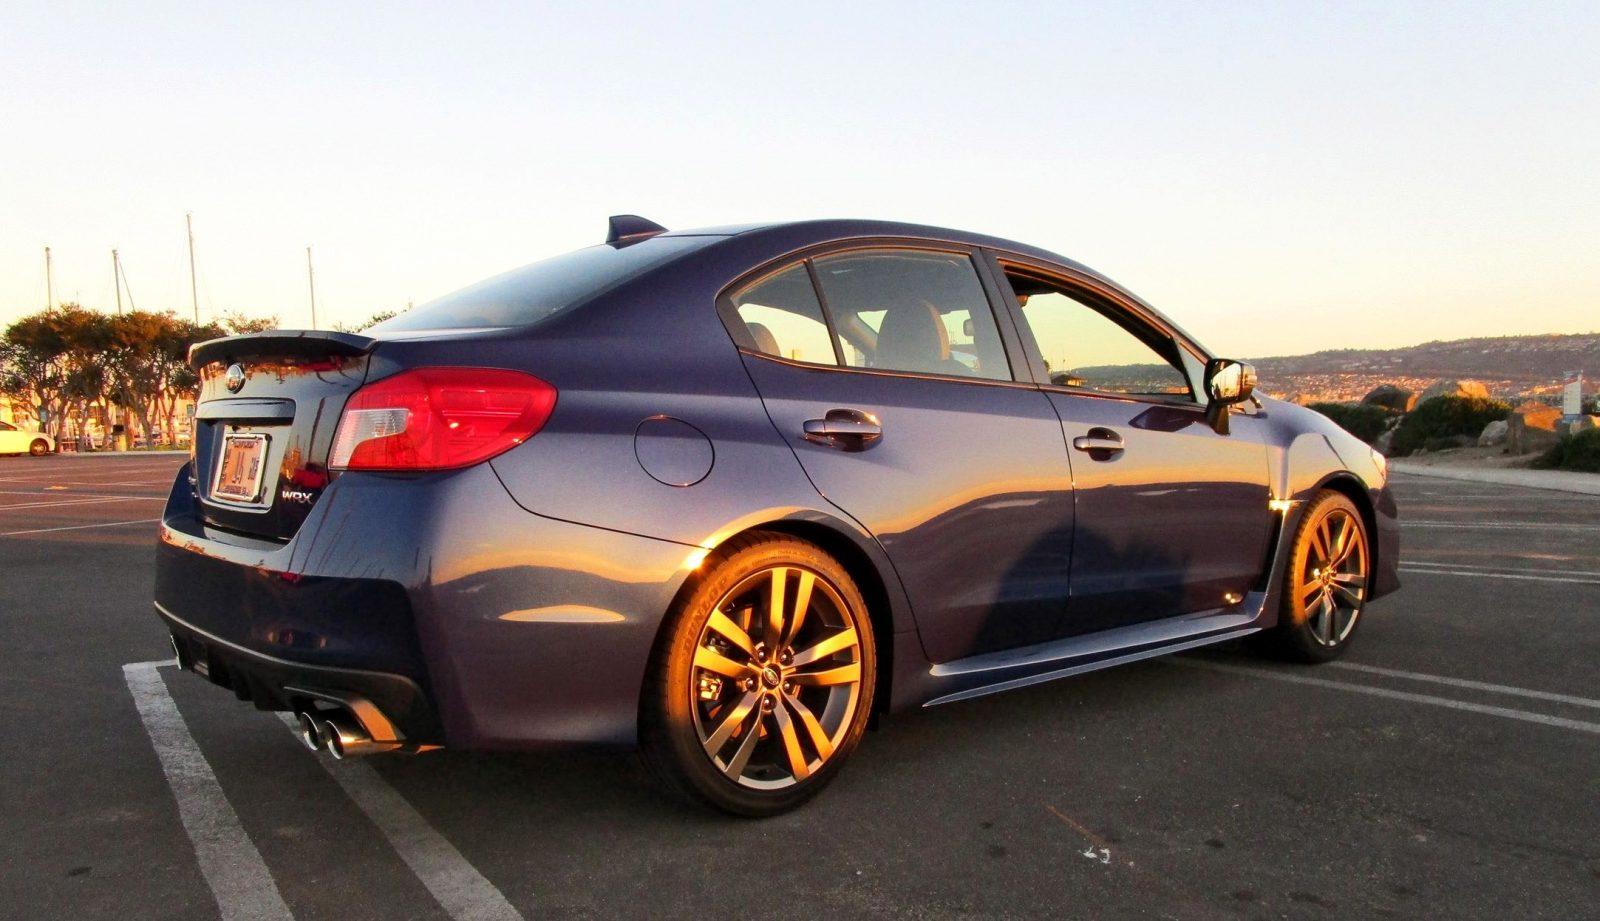 2017 Subaru Wrx 6